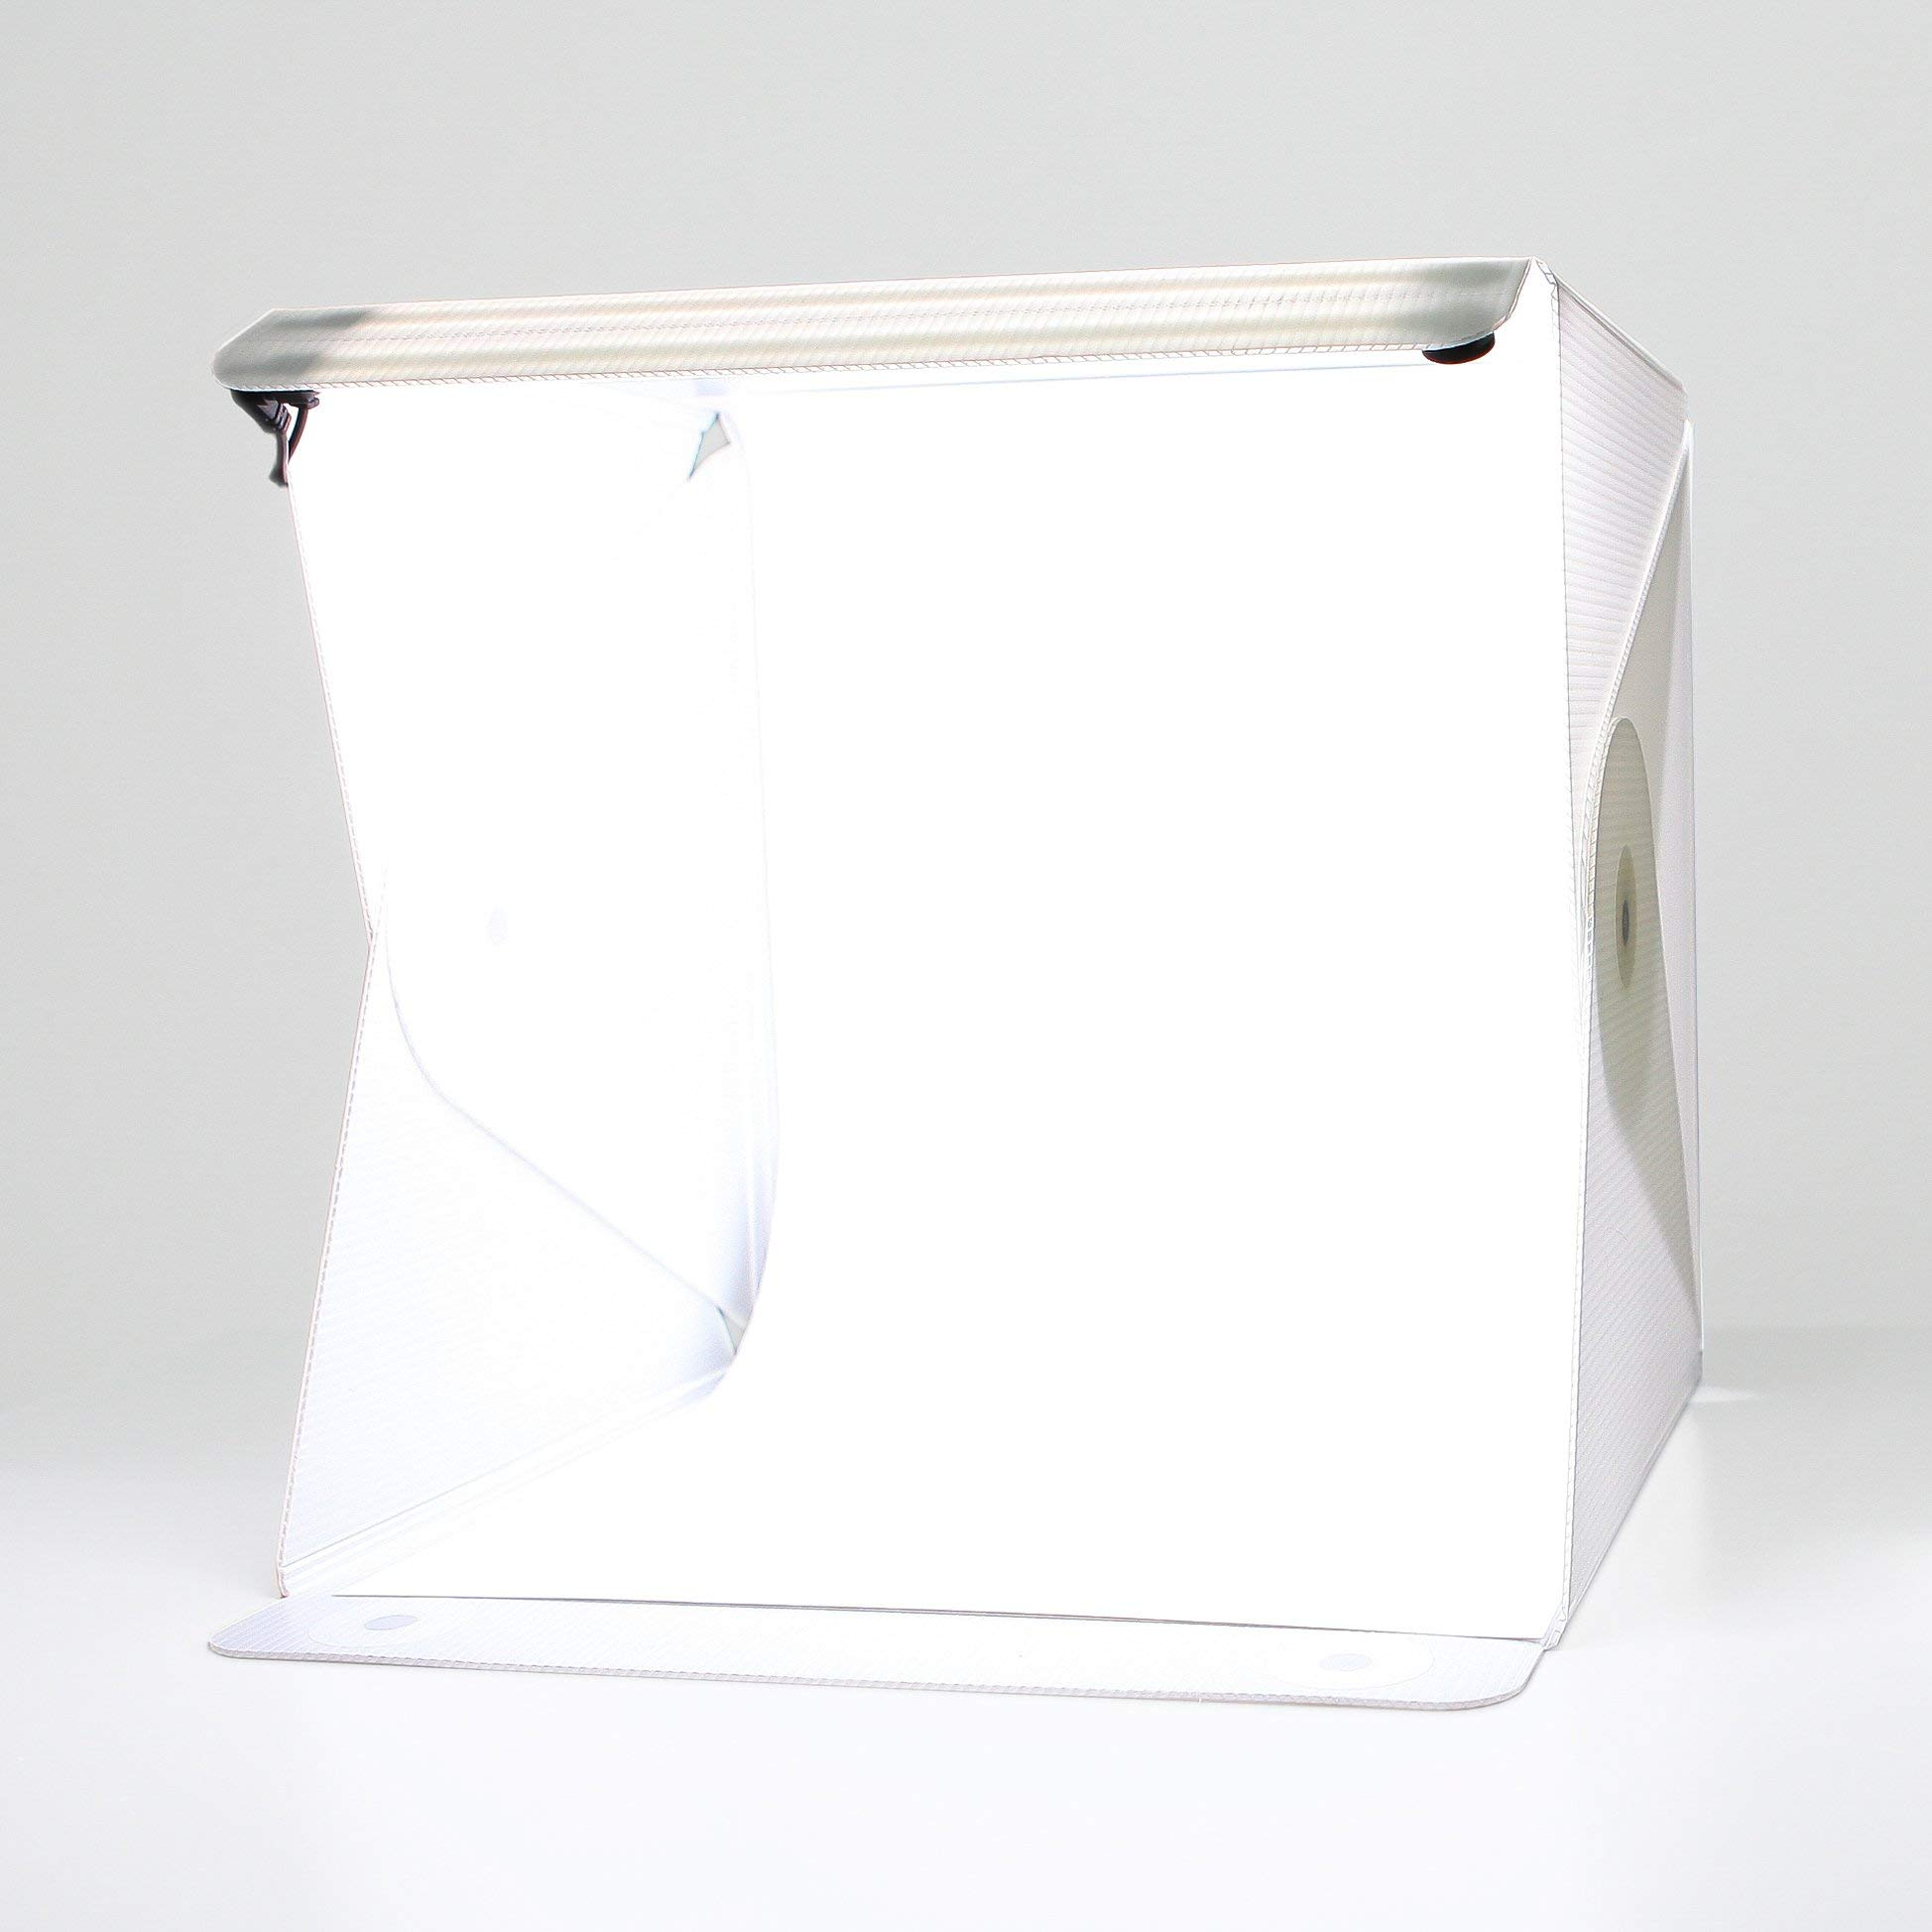 Orangemonkie Foldio2 15-Inch Folding Portable Lightbox Studio for Smartphone or DSLR (Renewed)